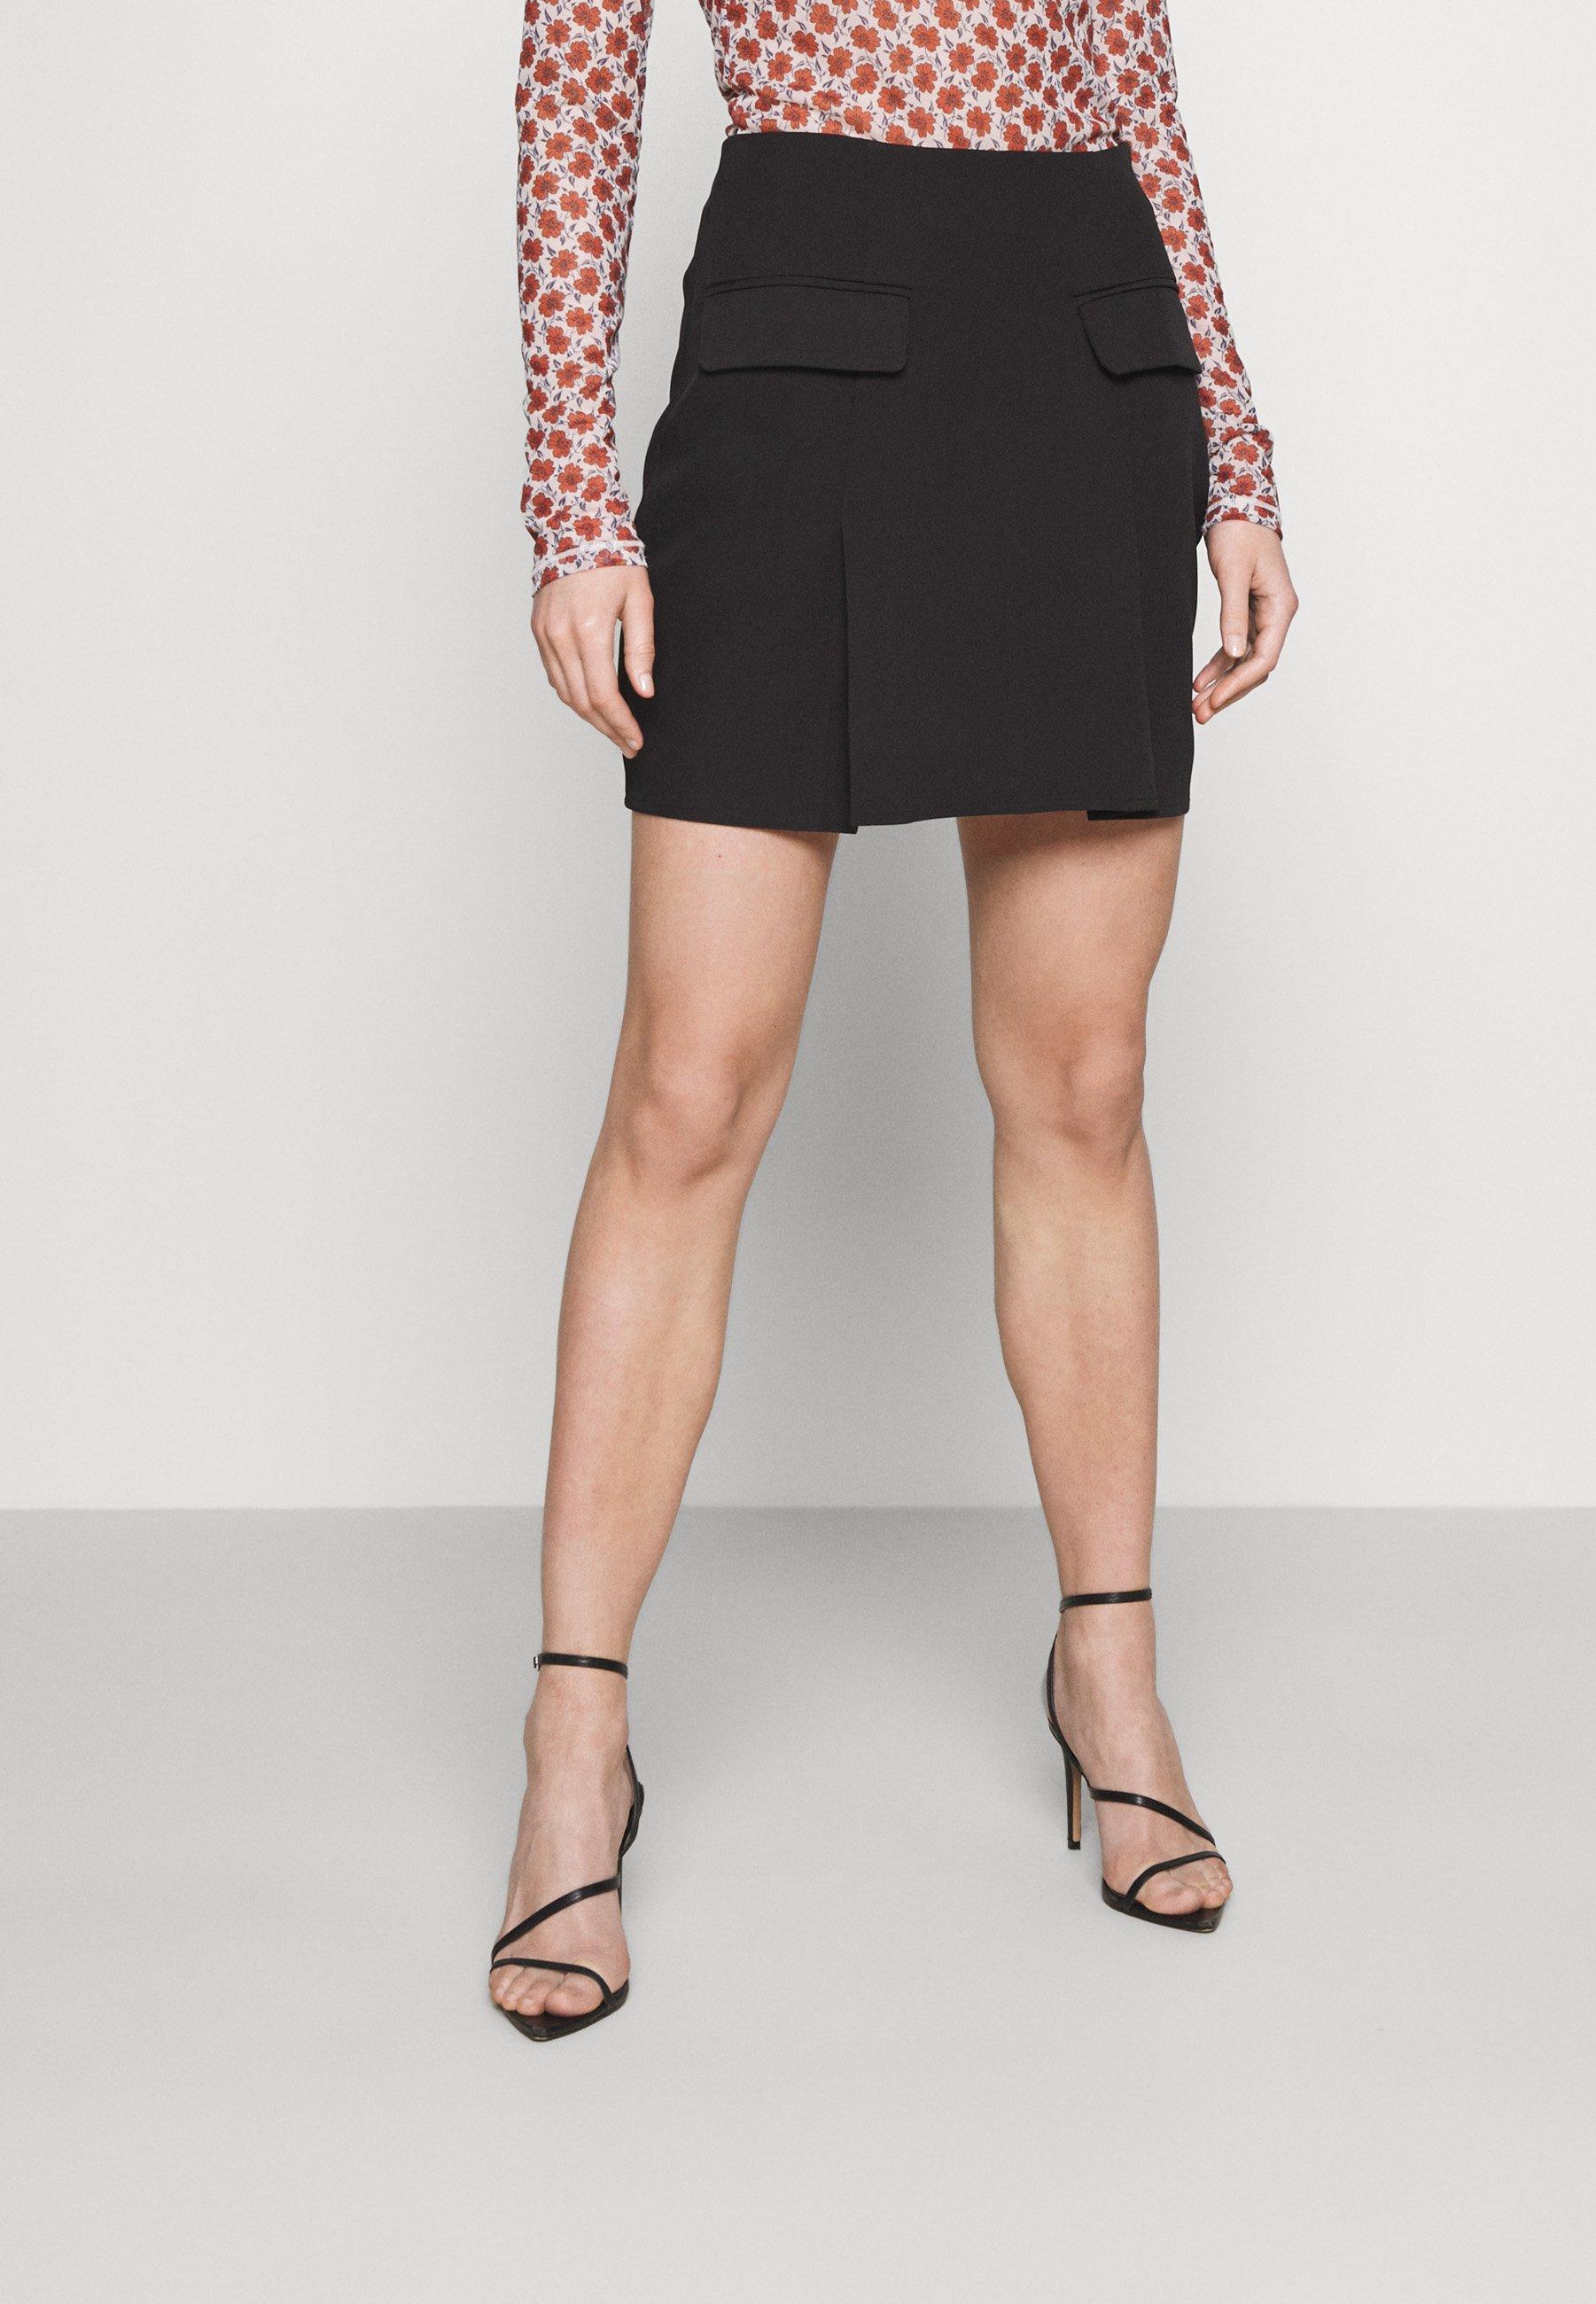 Femme COORD TAILORED POCKET DETAIL - Minijupe